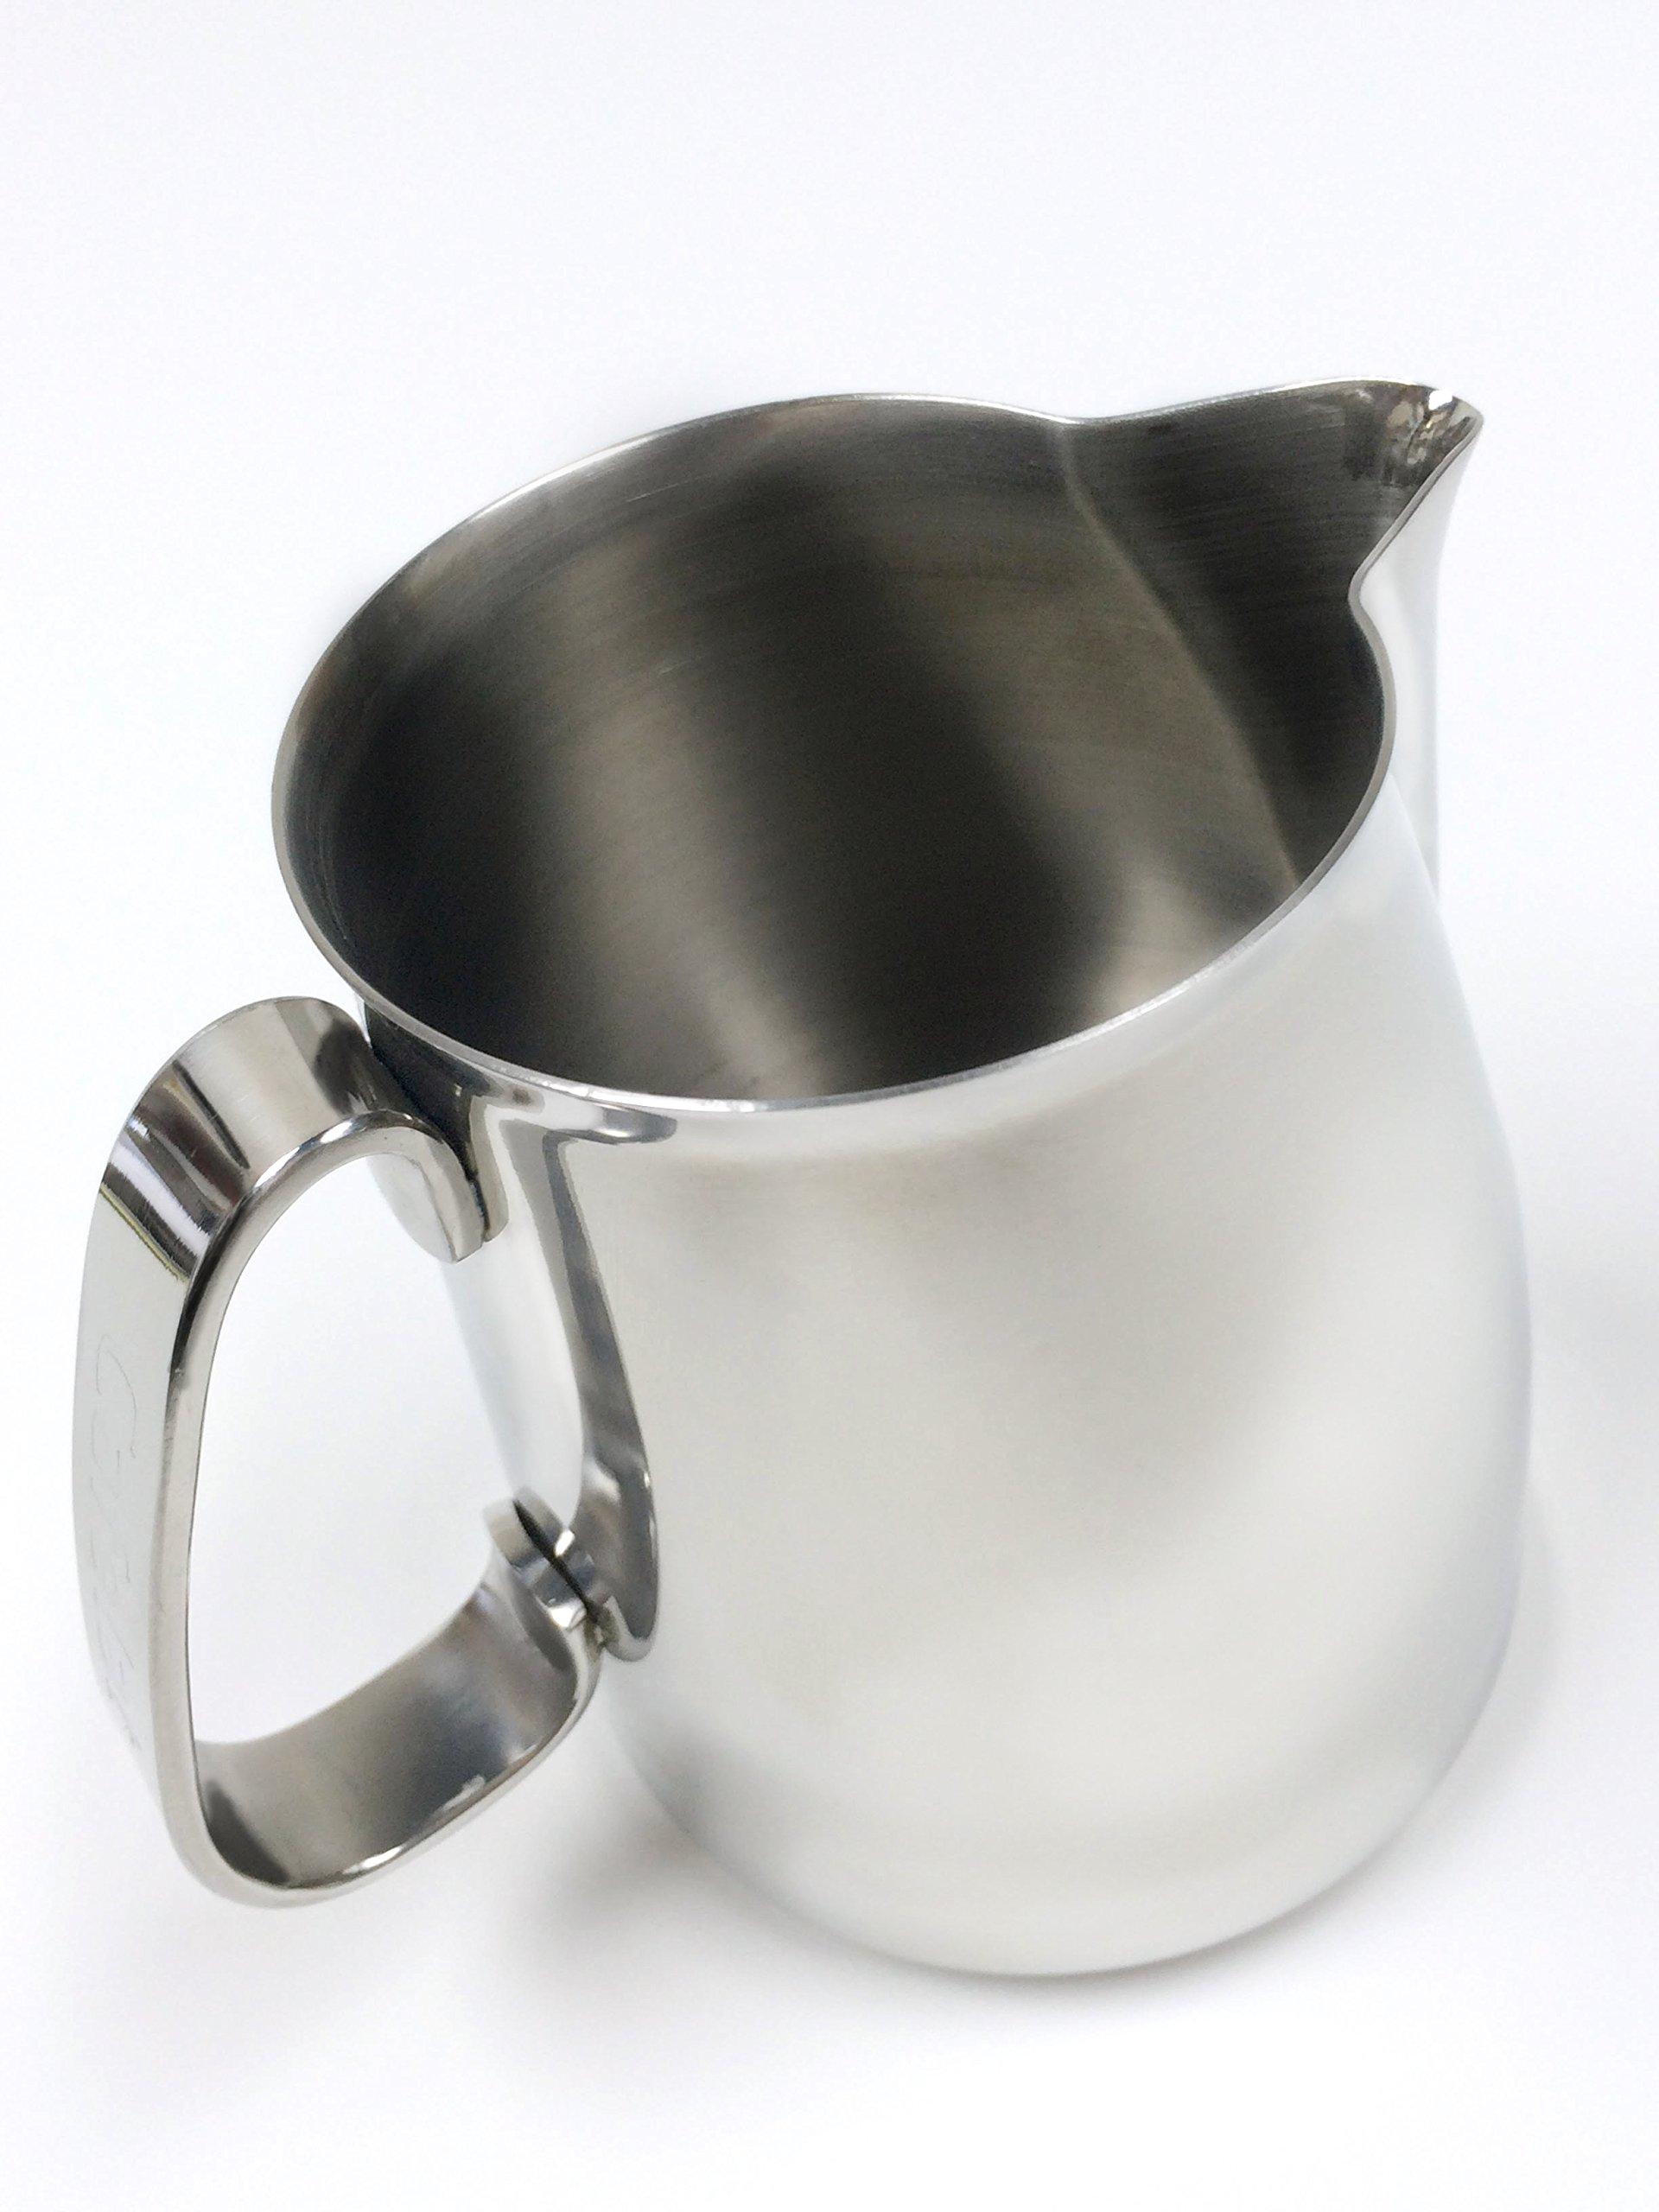 Cafelat Milk Steaming Pitcher (med 17oz(500ml)) by Cafelat